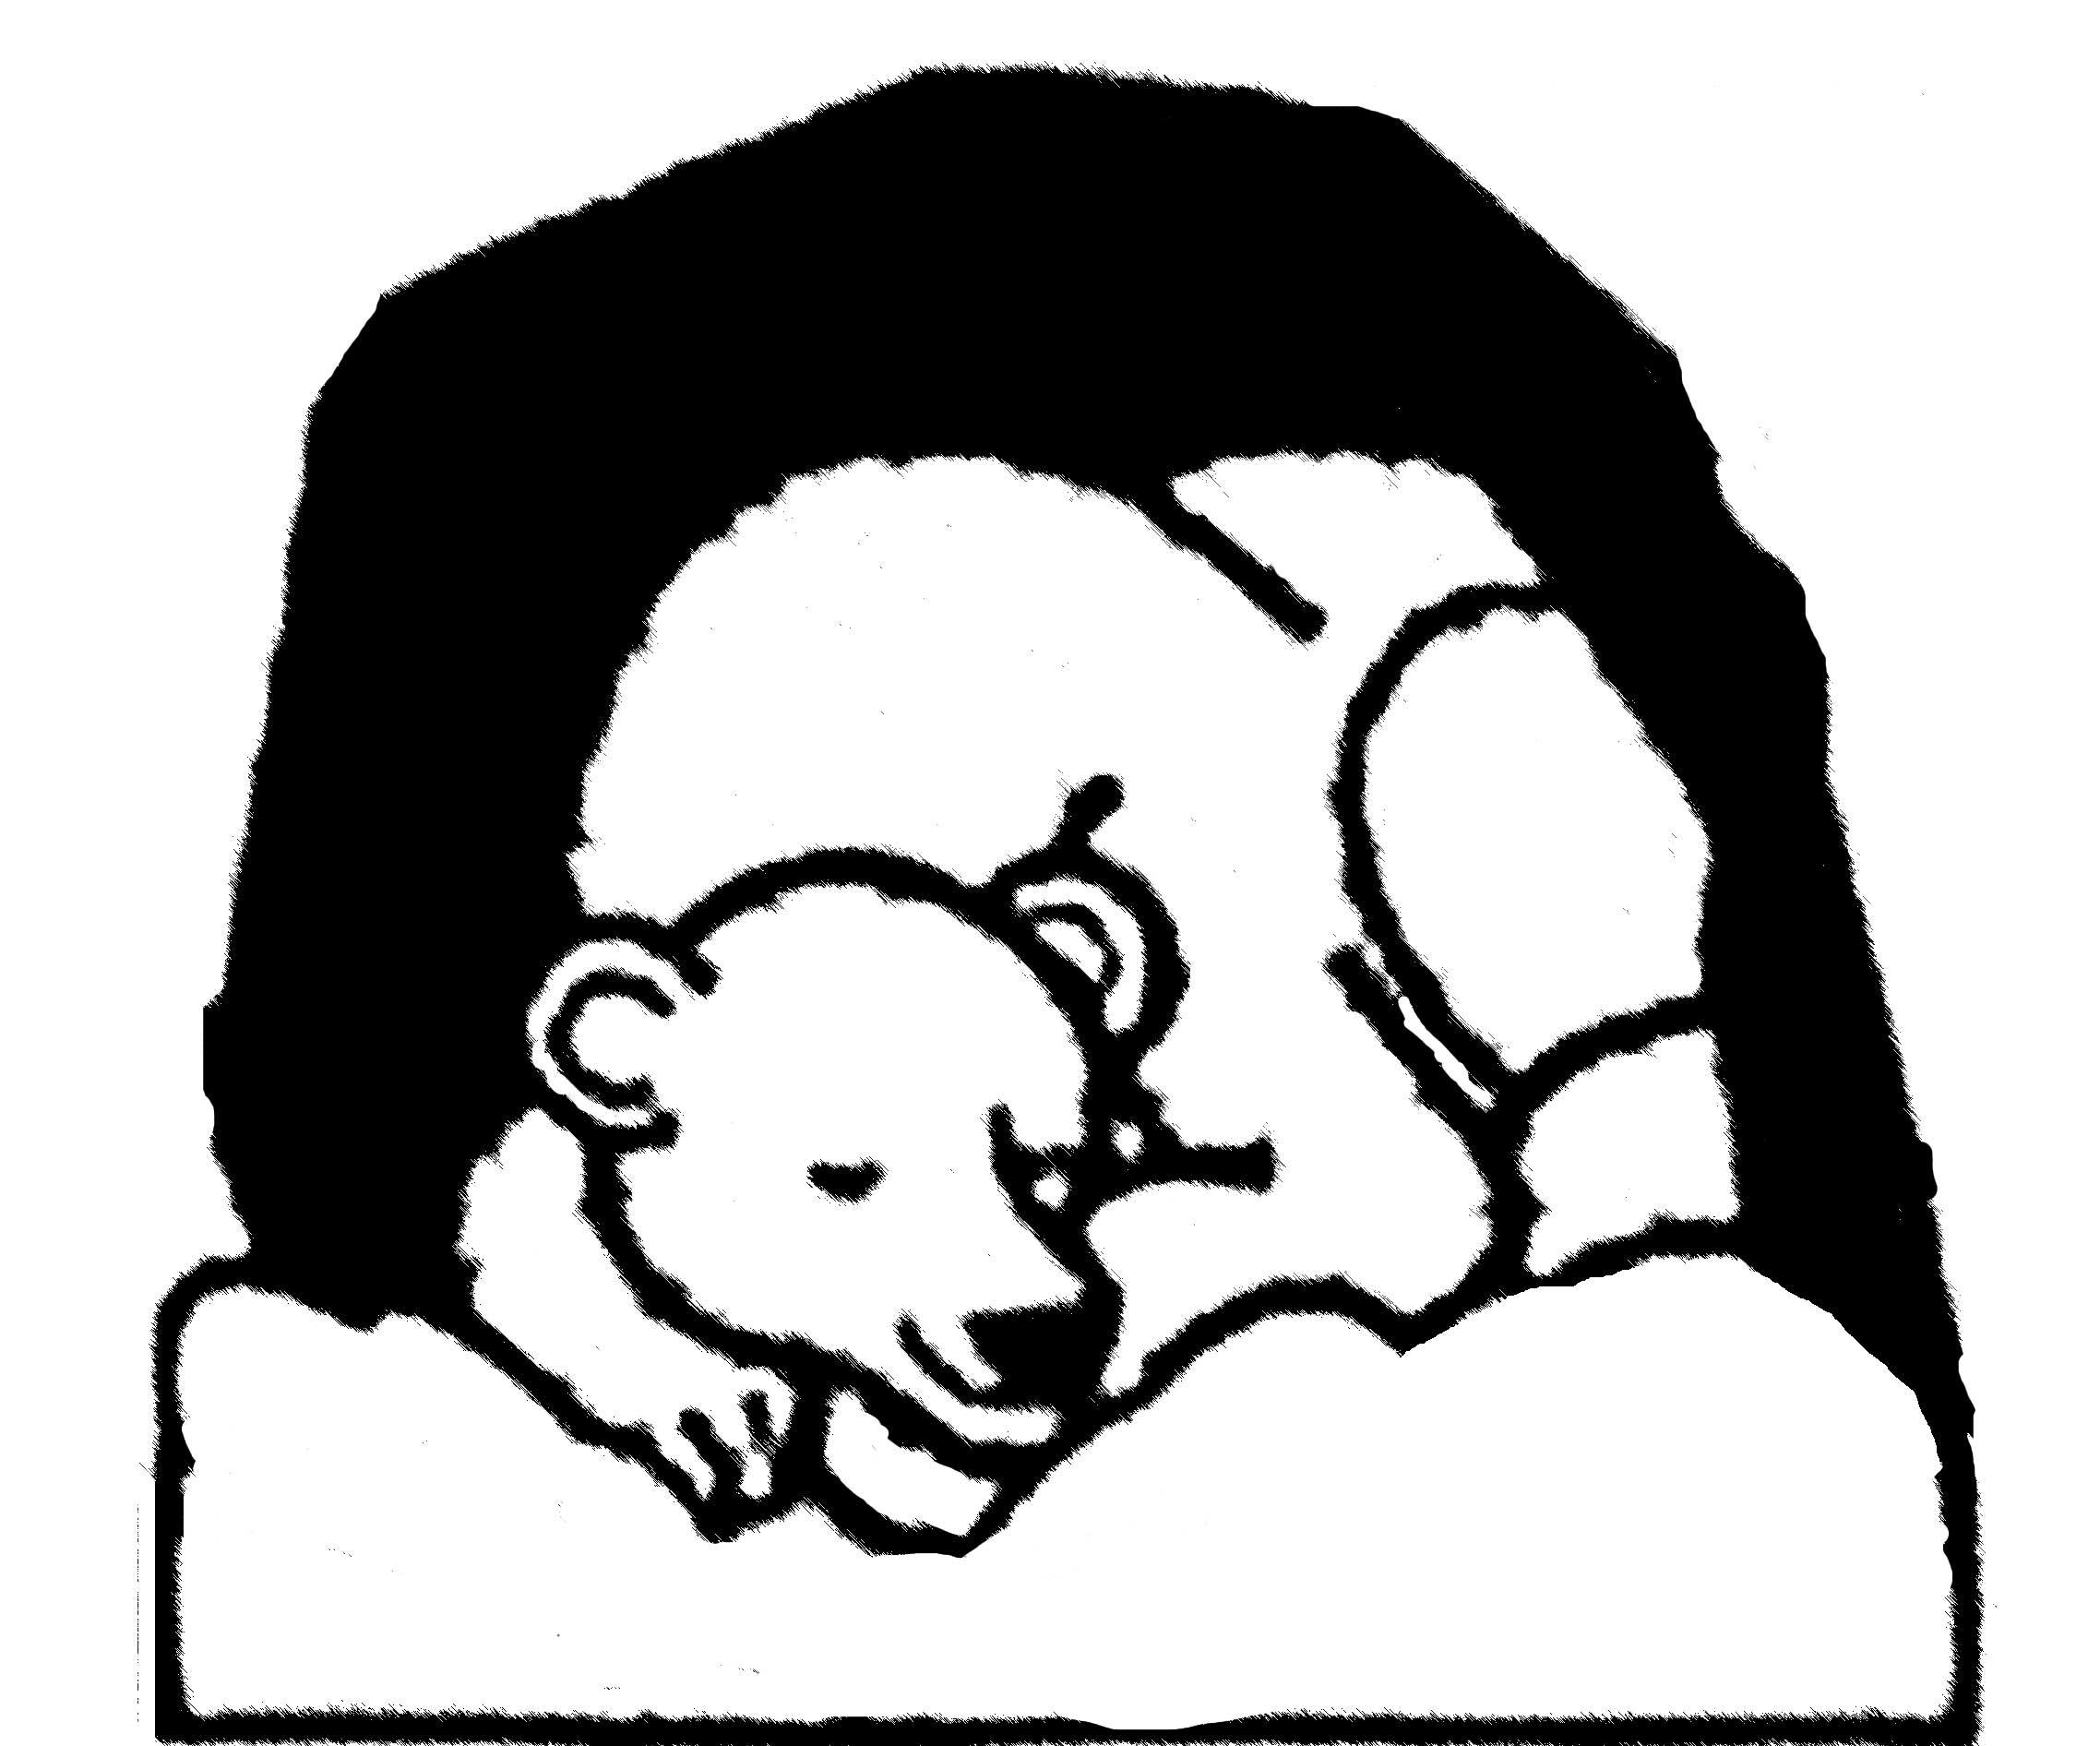 Clipart of a face of a sleeping bear jpg free library Free Sleeping Bear Clipart, Download Free Clip Art, Free Clip Art on ... jpg free library